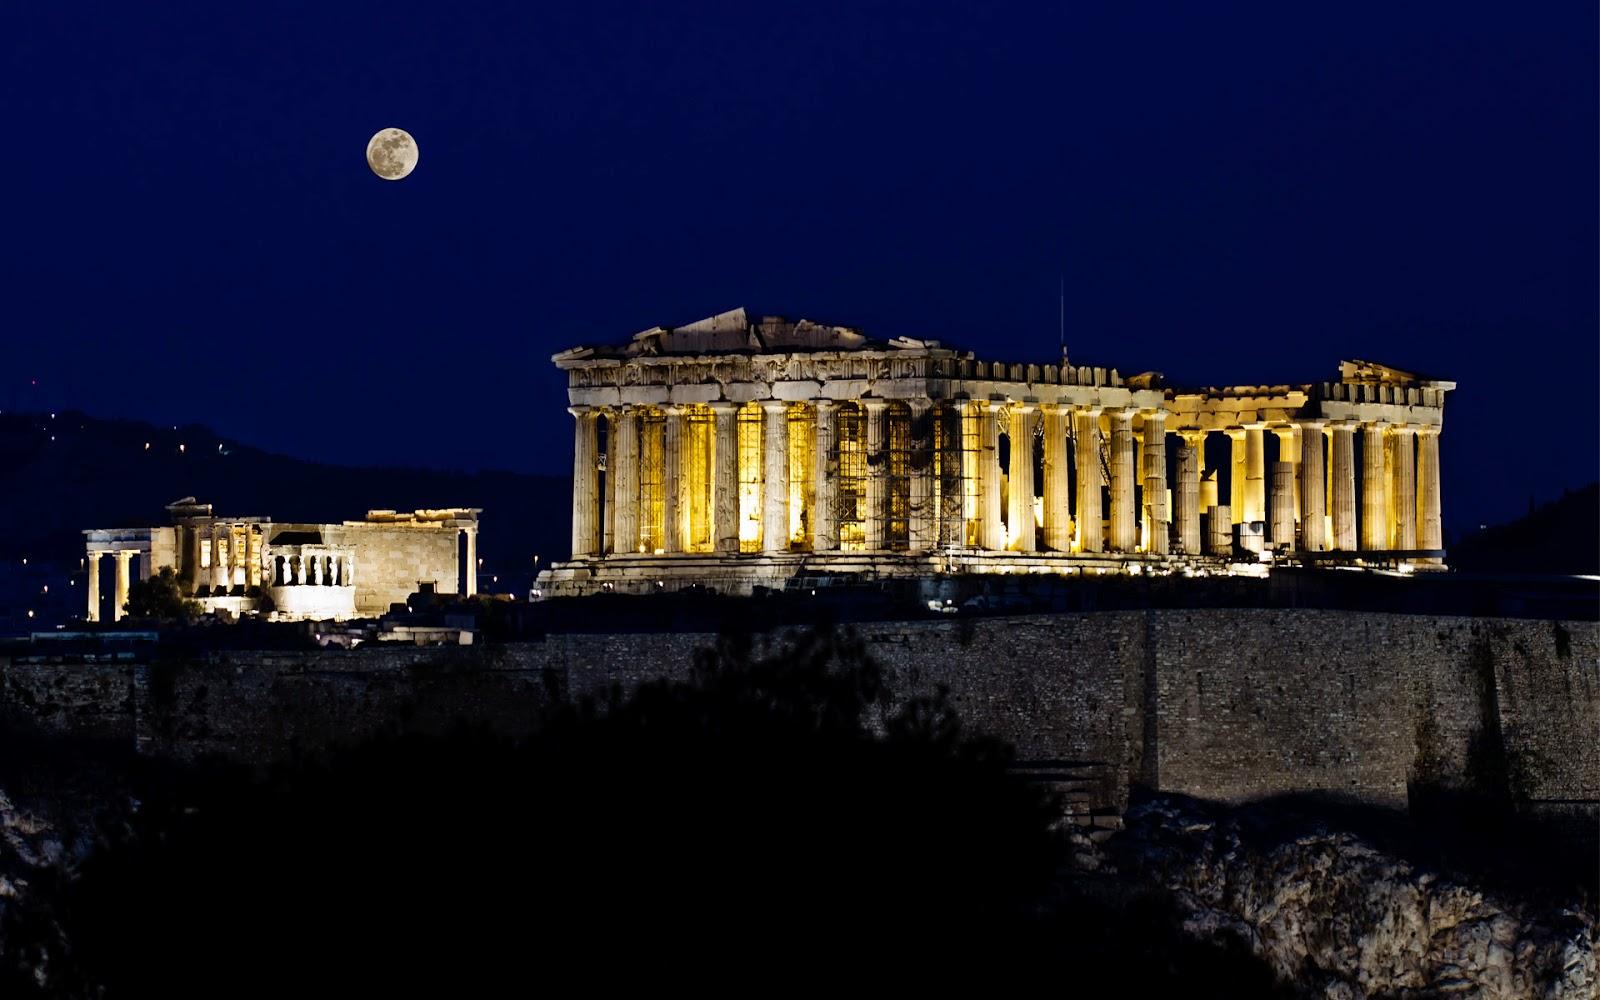 acropolis_1920x1200